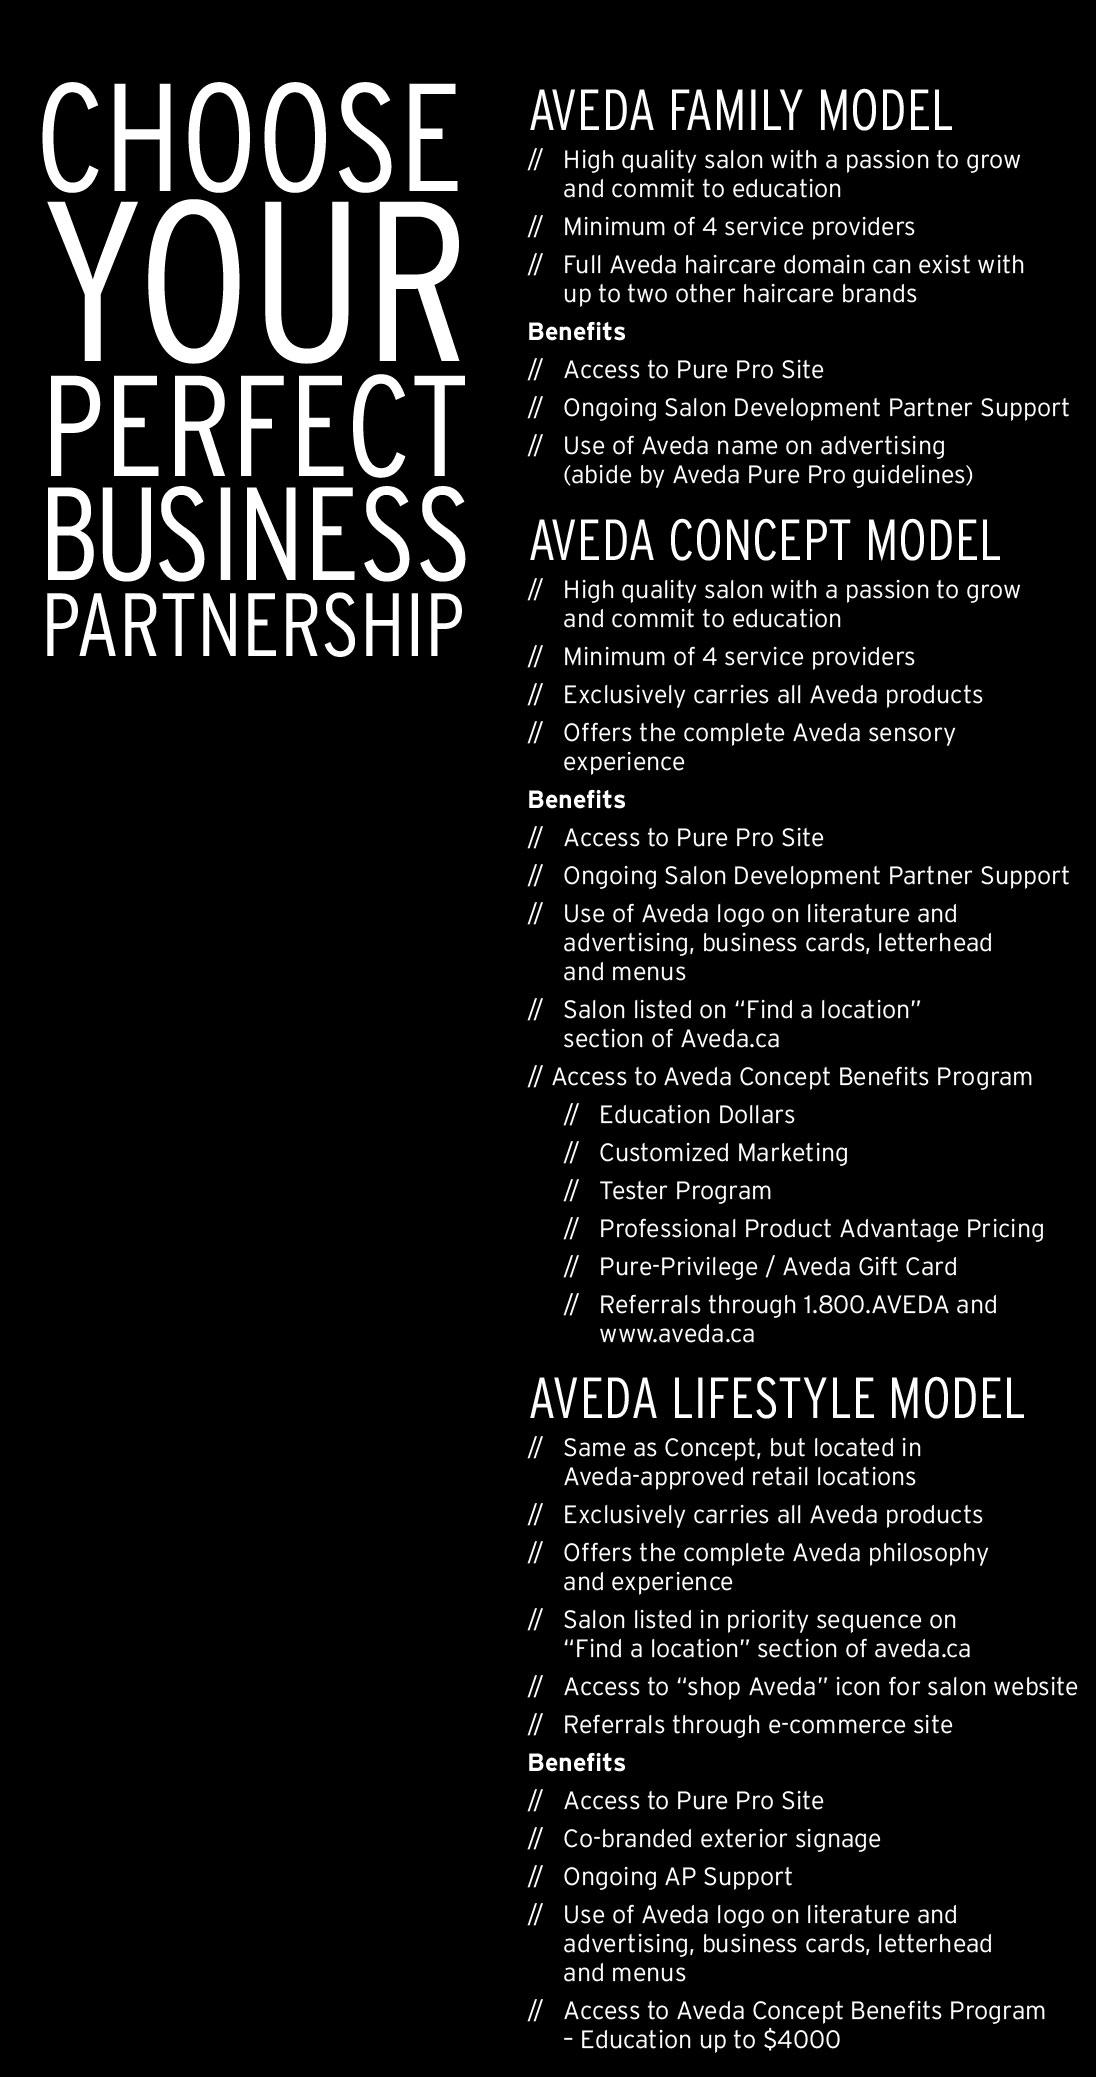 AVEDA-NEW-BUSINESS---WHY_09.jpg